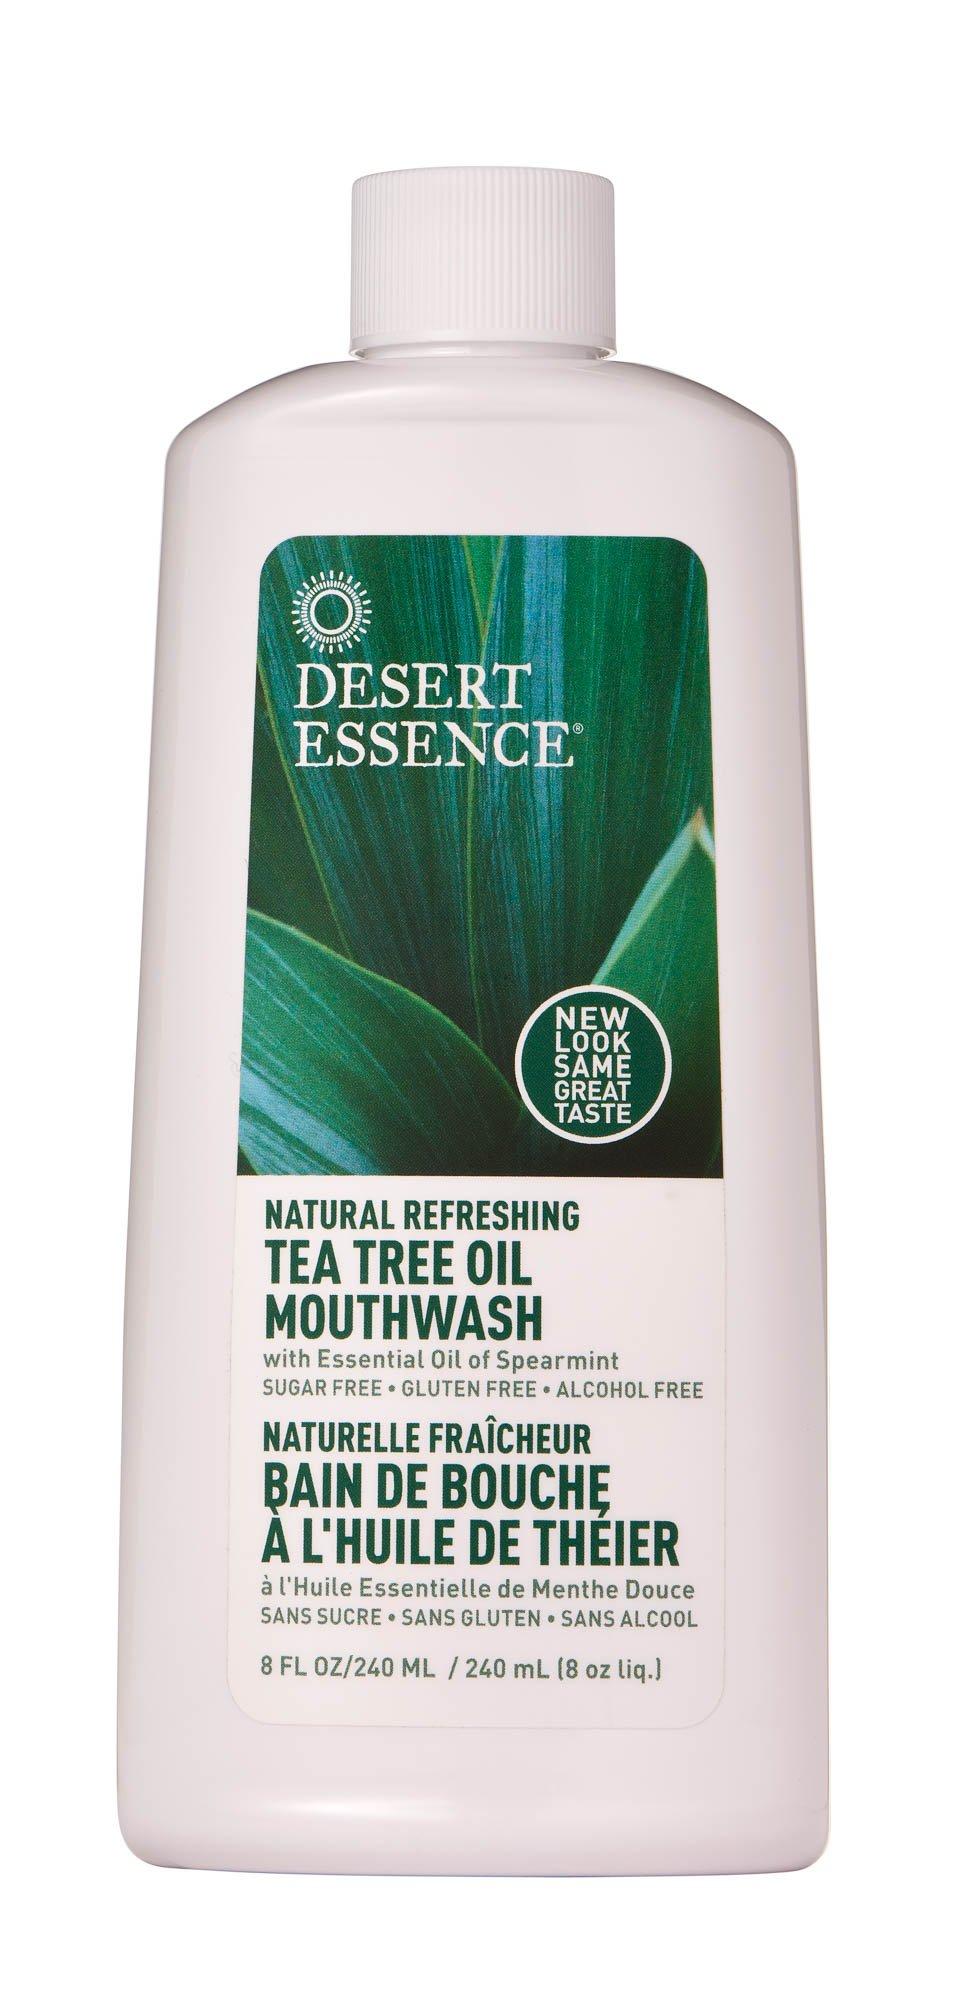 Desert Essence, Mouthwash Tea Tree Oil, 8 Fl Oz